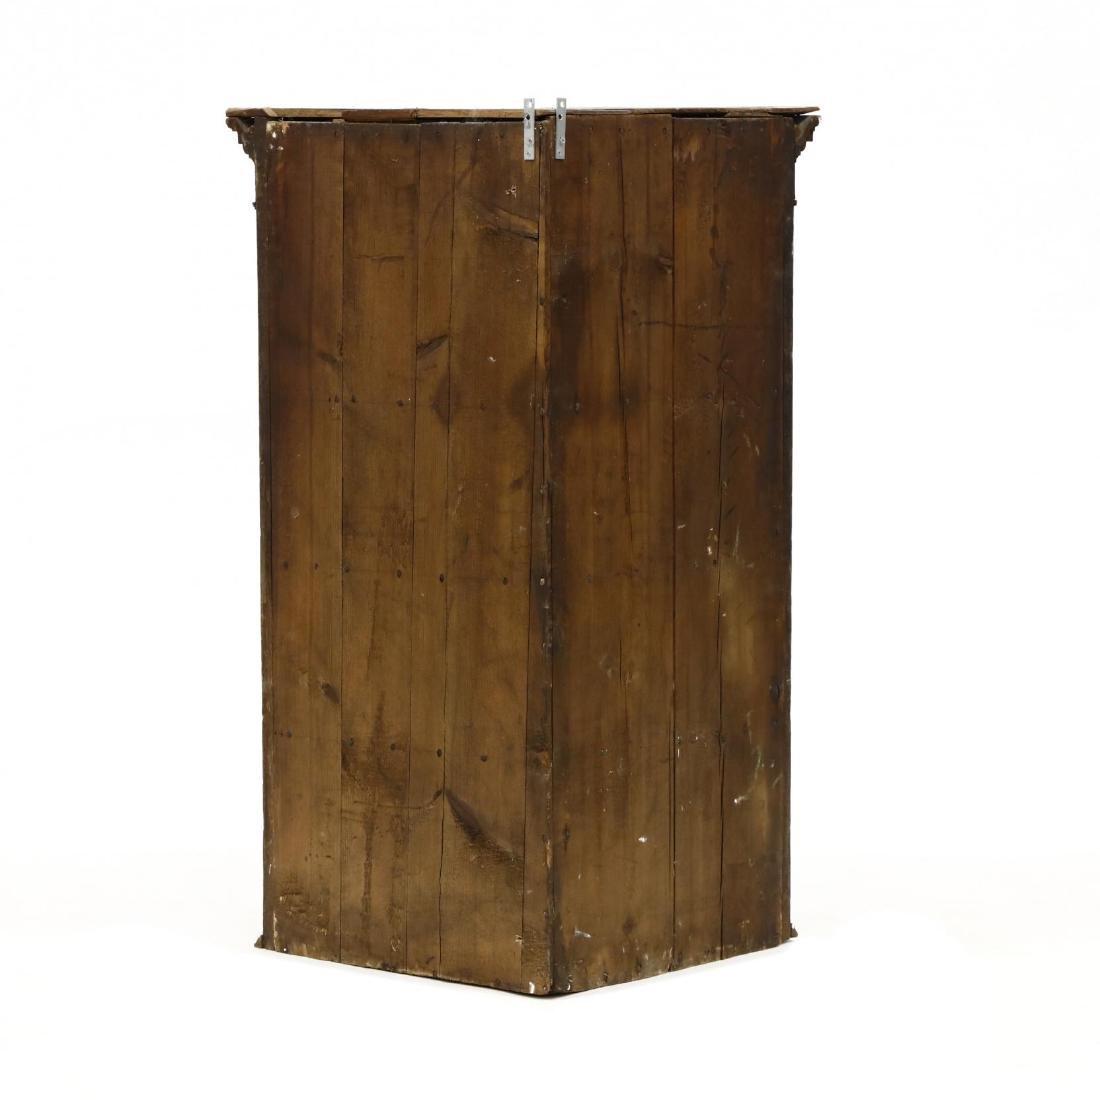 George III Carved Oak Hanging Corner Cupboard - 3